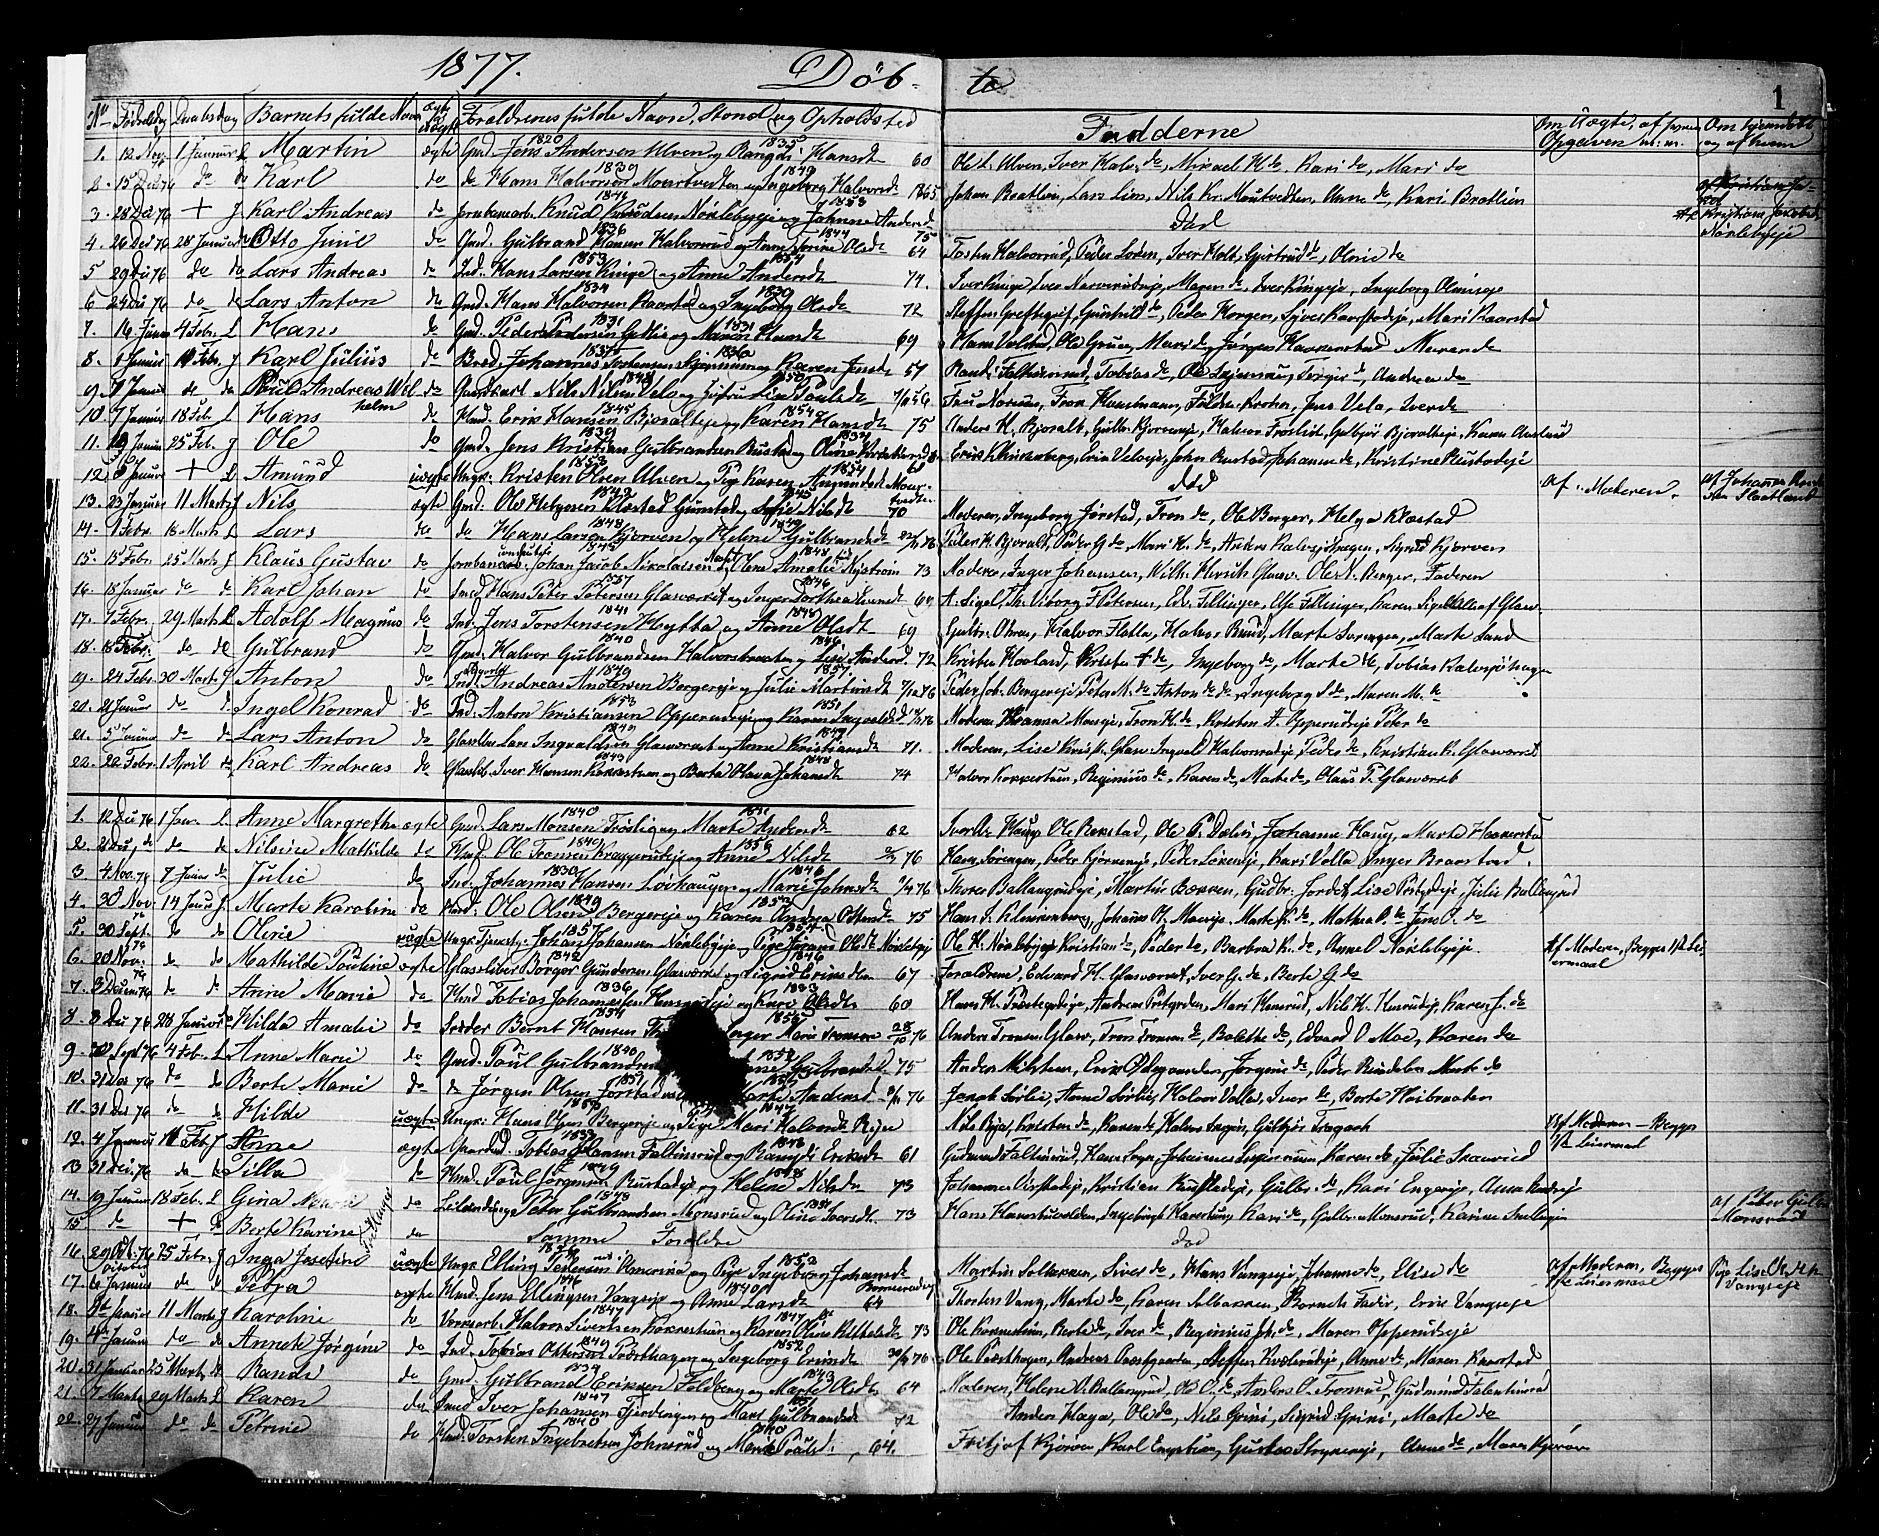 SAH, Jevnaker prestekontor, Ministerialbok nr. 8, 1877-1890, s. 1